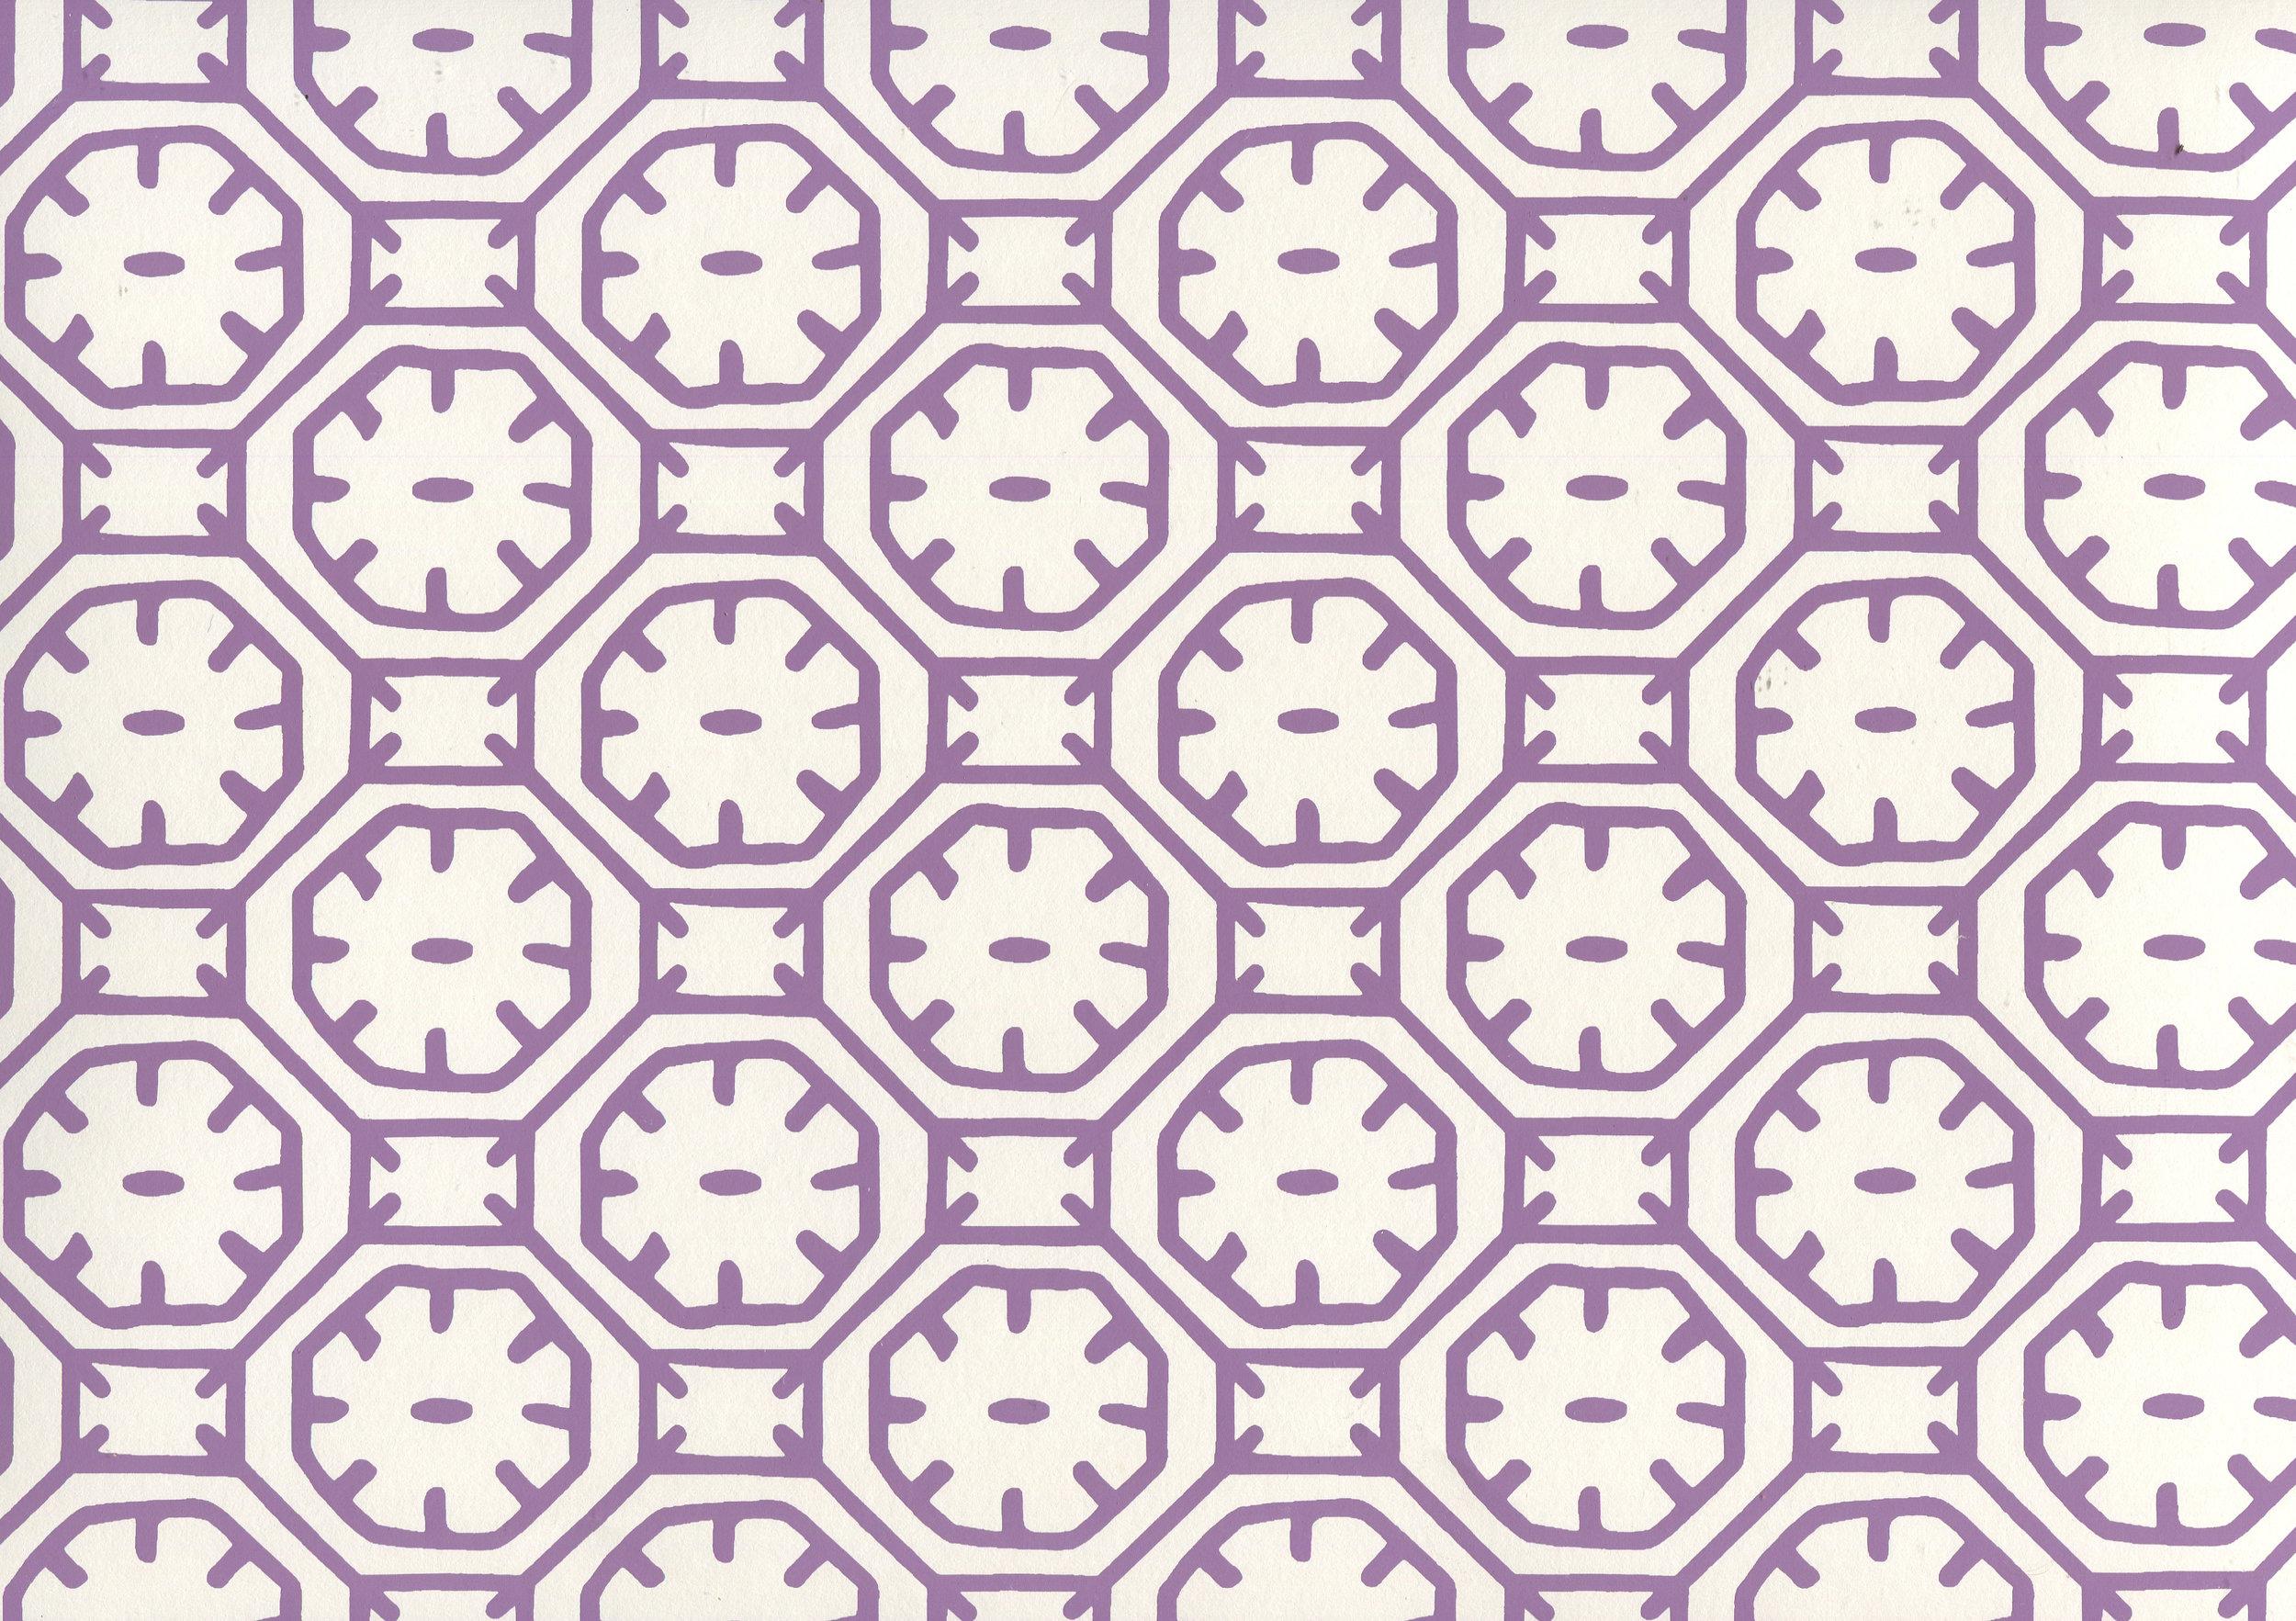 Ceylon-Batik-Purple-on-Almost-White-8150WP-08-2400.jpg